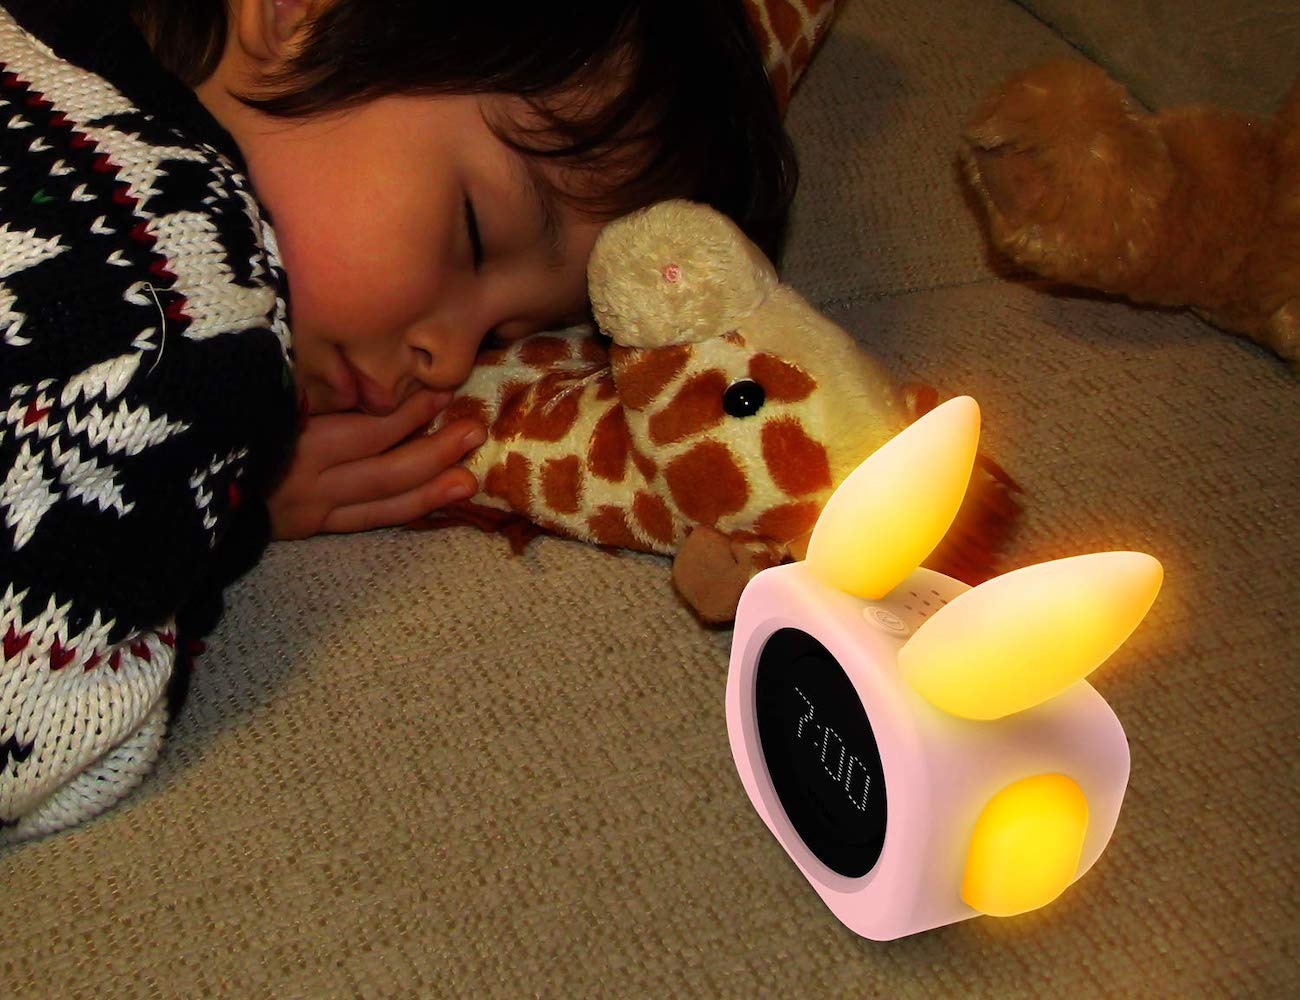 Vobot Bunny Smart Sleep Trainer tells your child went to get up or sleep